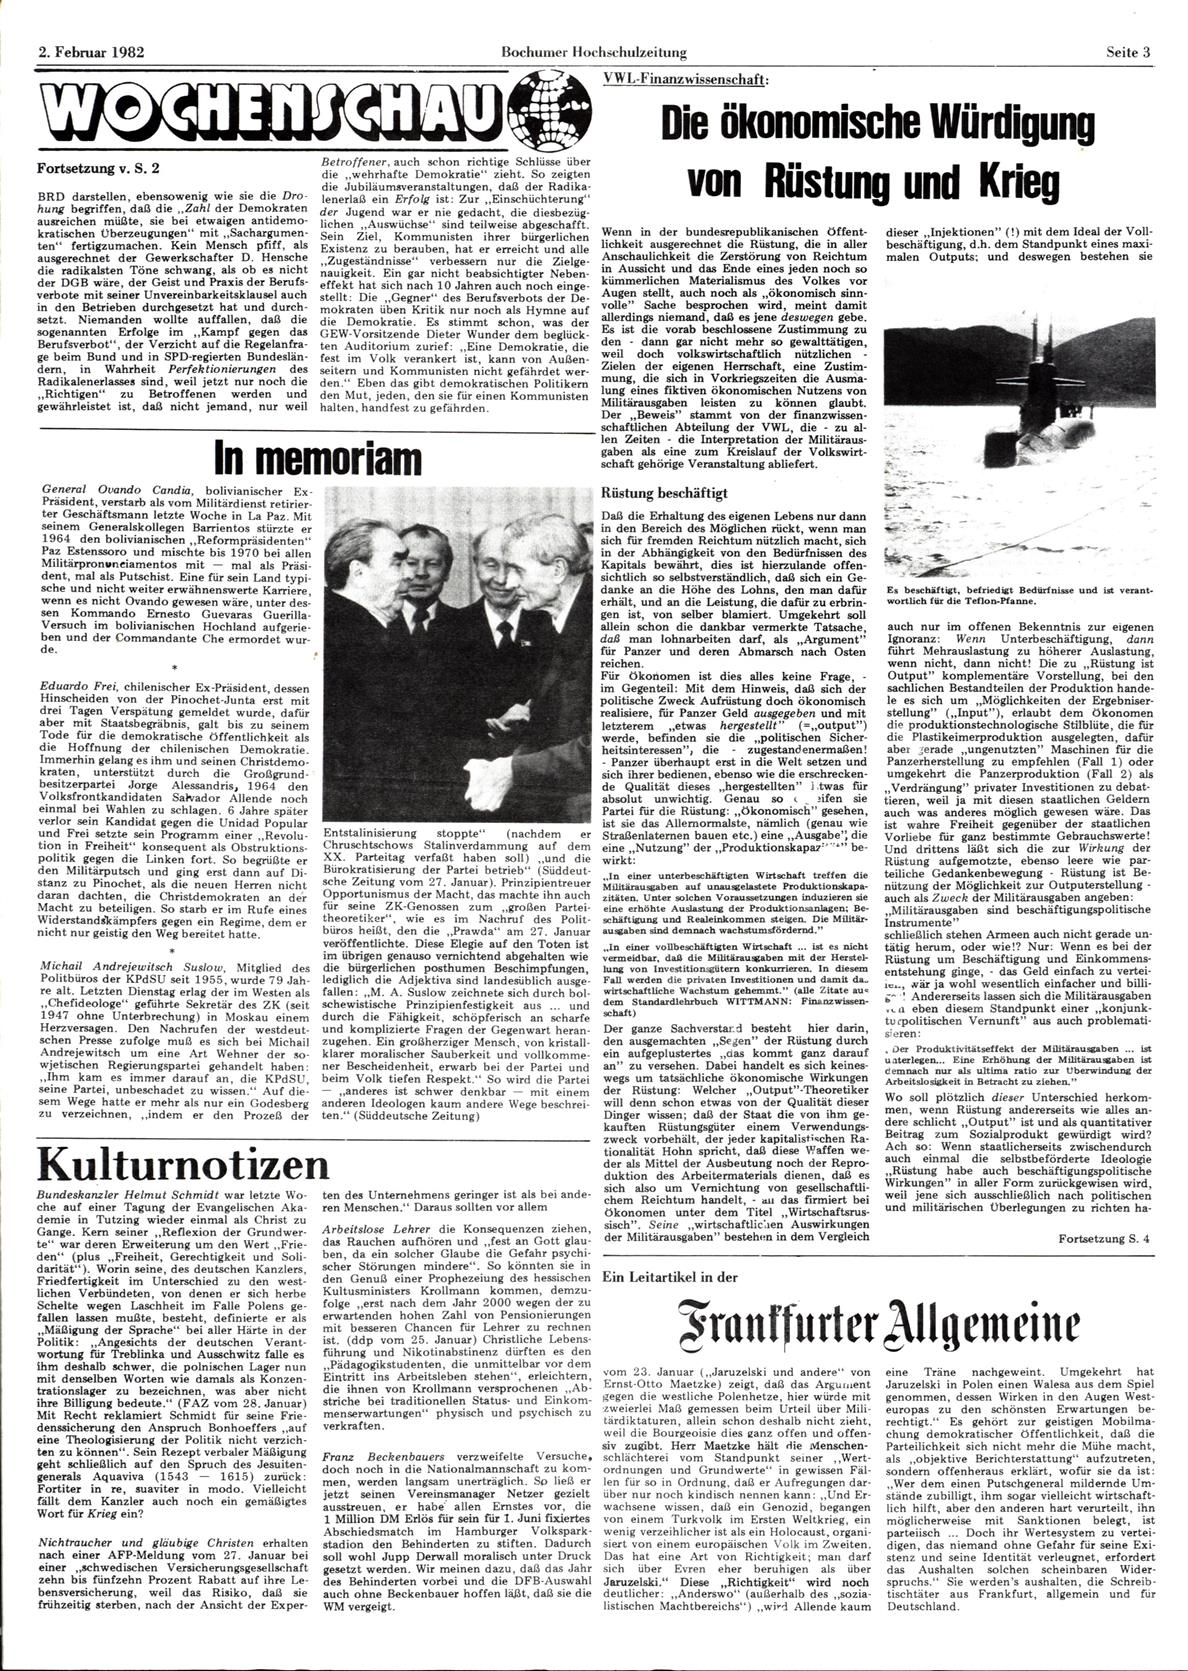 Bochum_BHZ_19820202_046_003